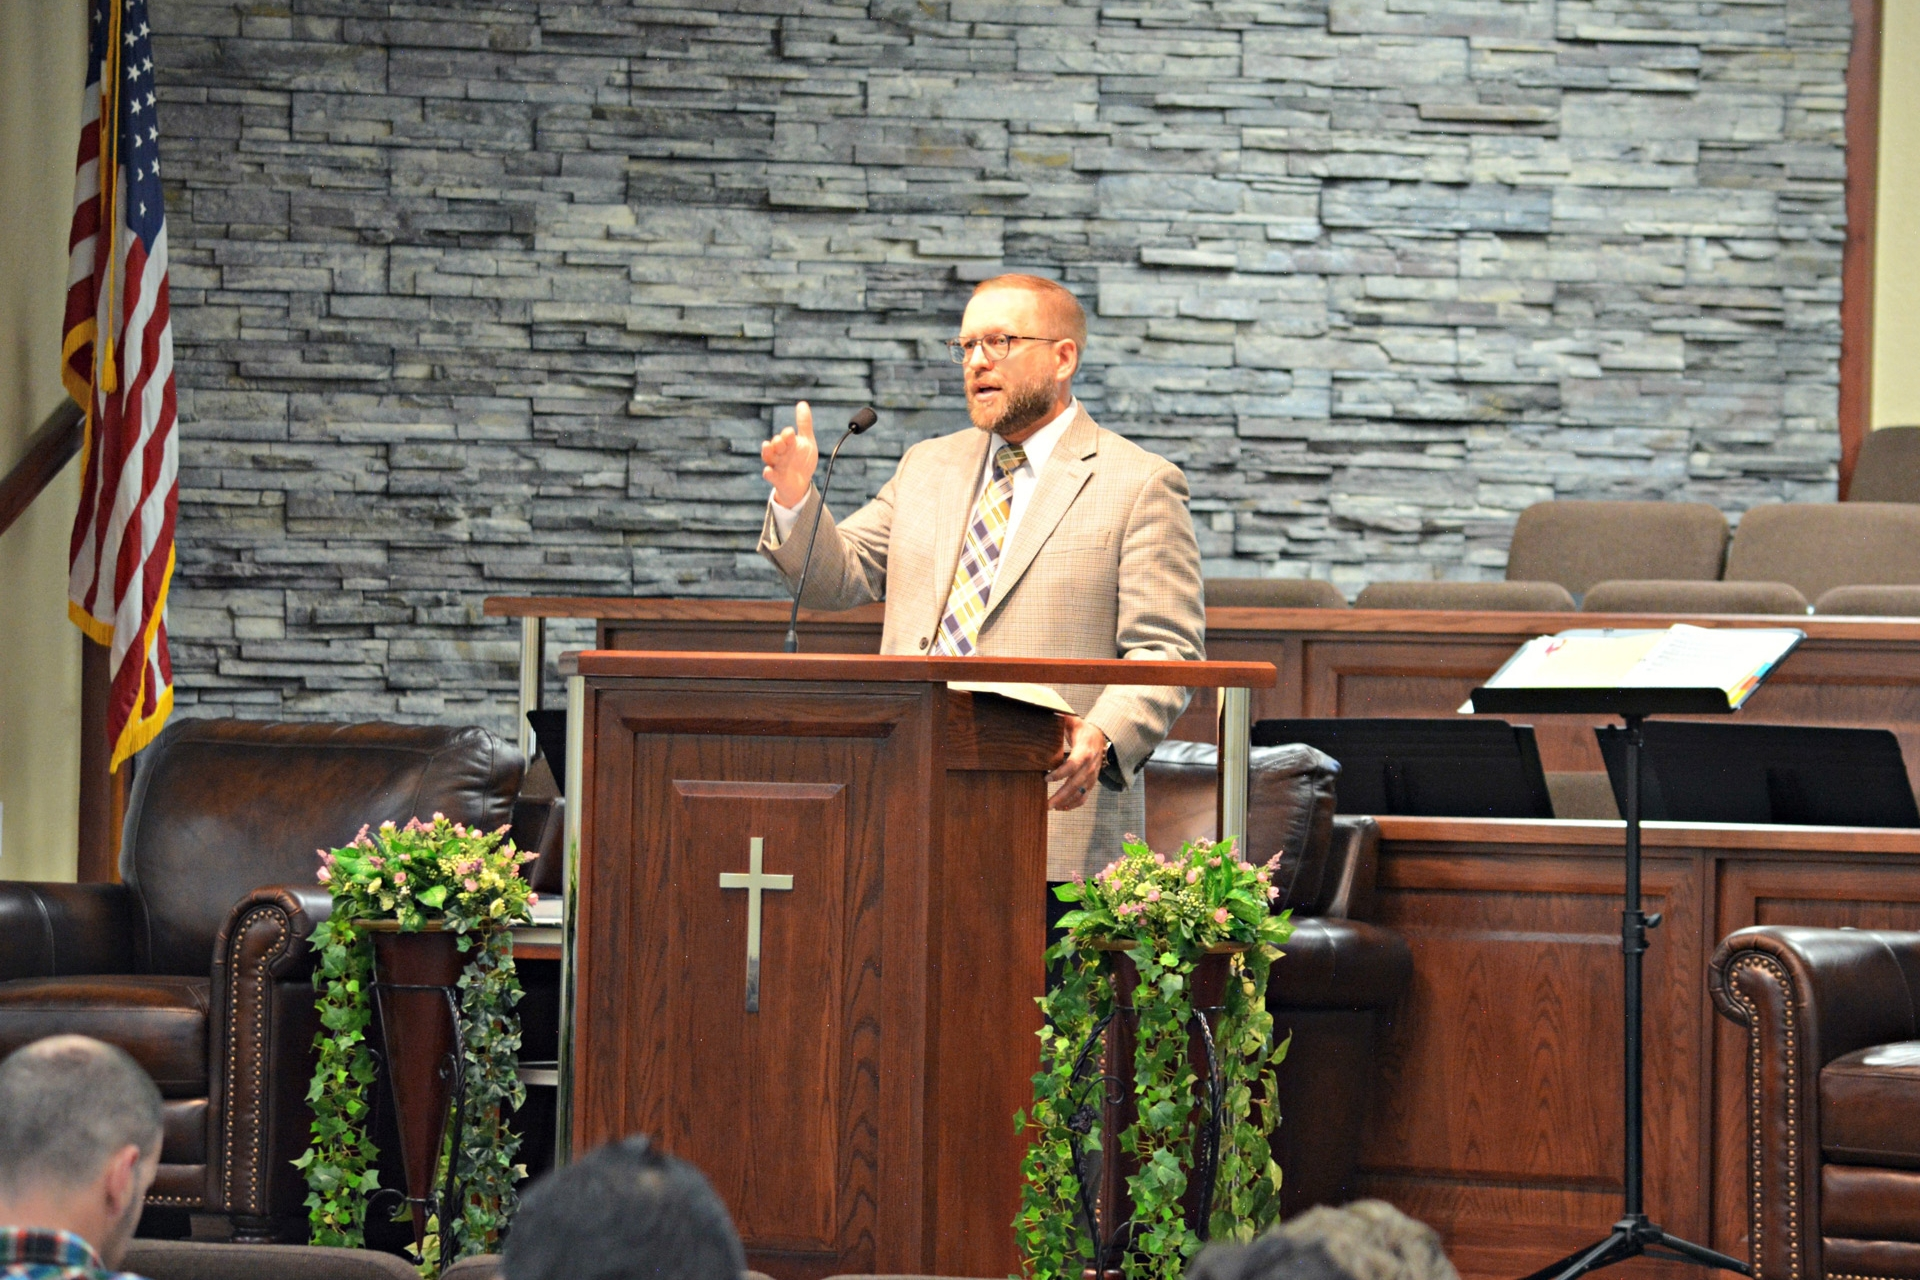 Pastor Reno